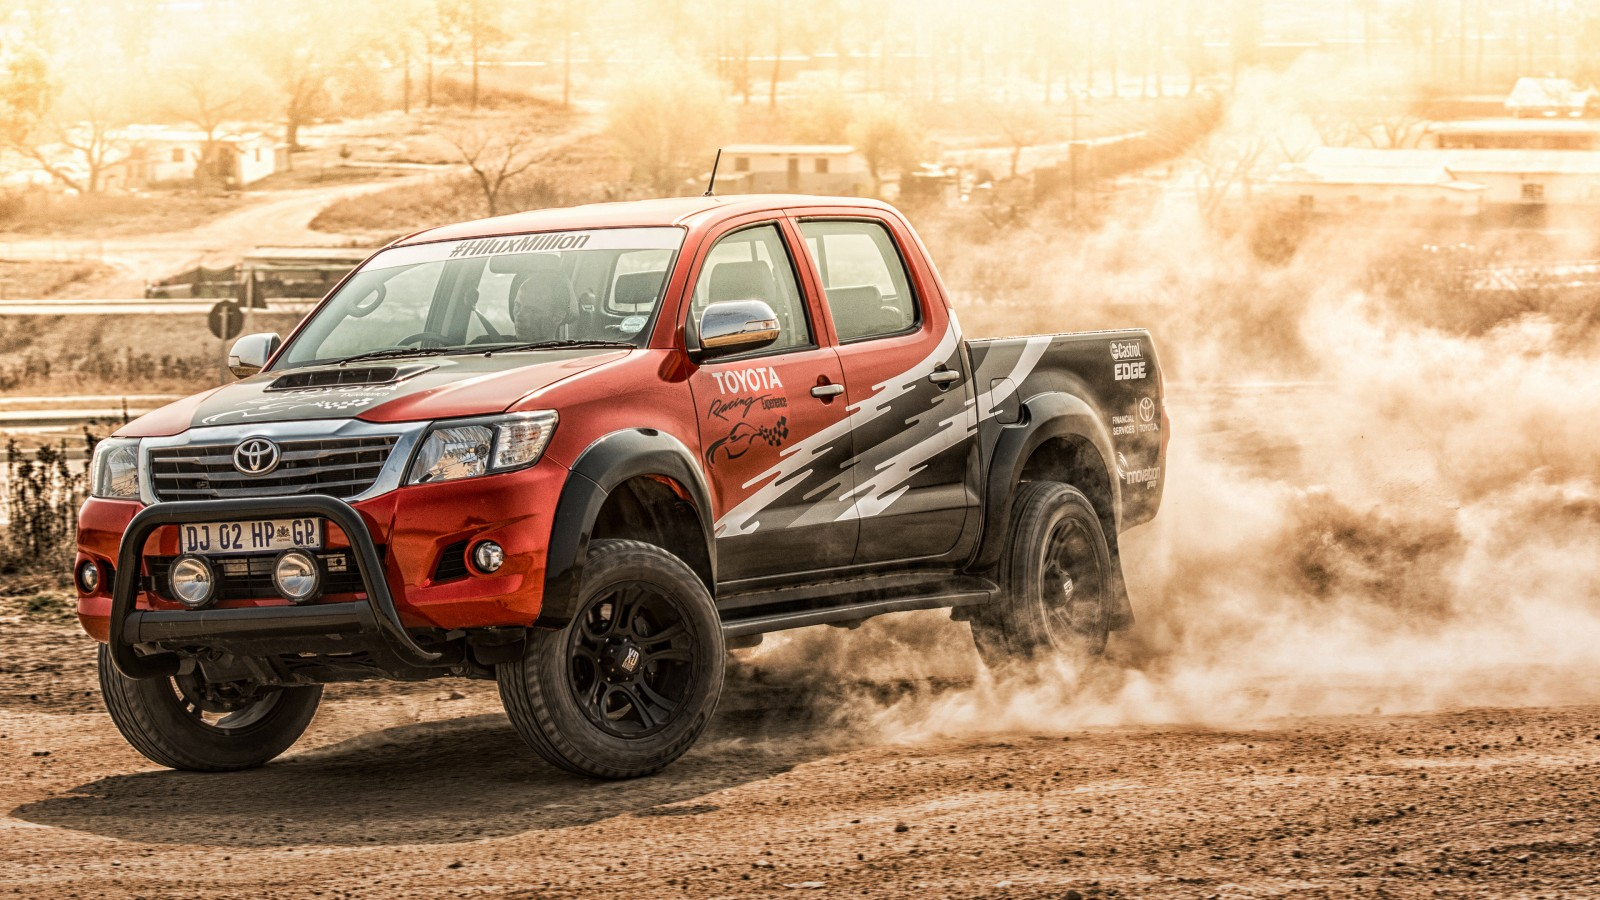 Toyota Hilux 2015 Wallpaper | HD Car Wallpapers | ID #5714